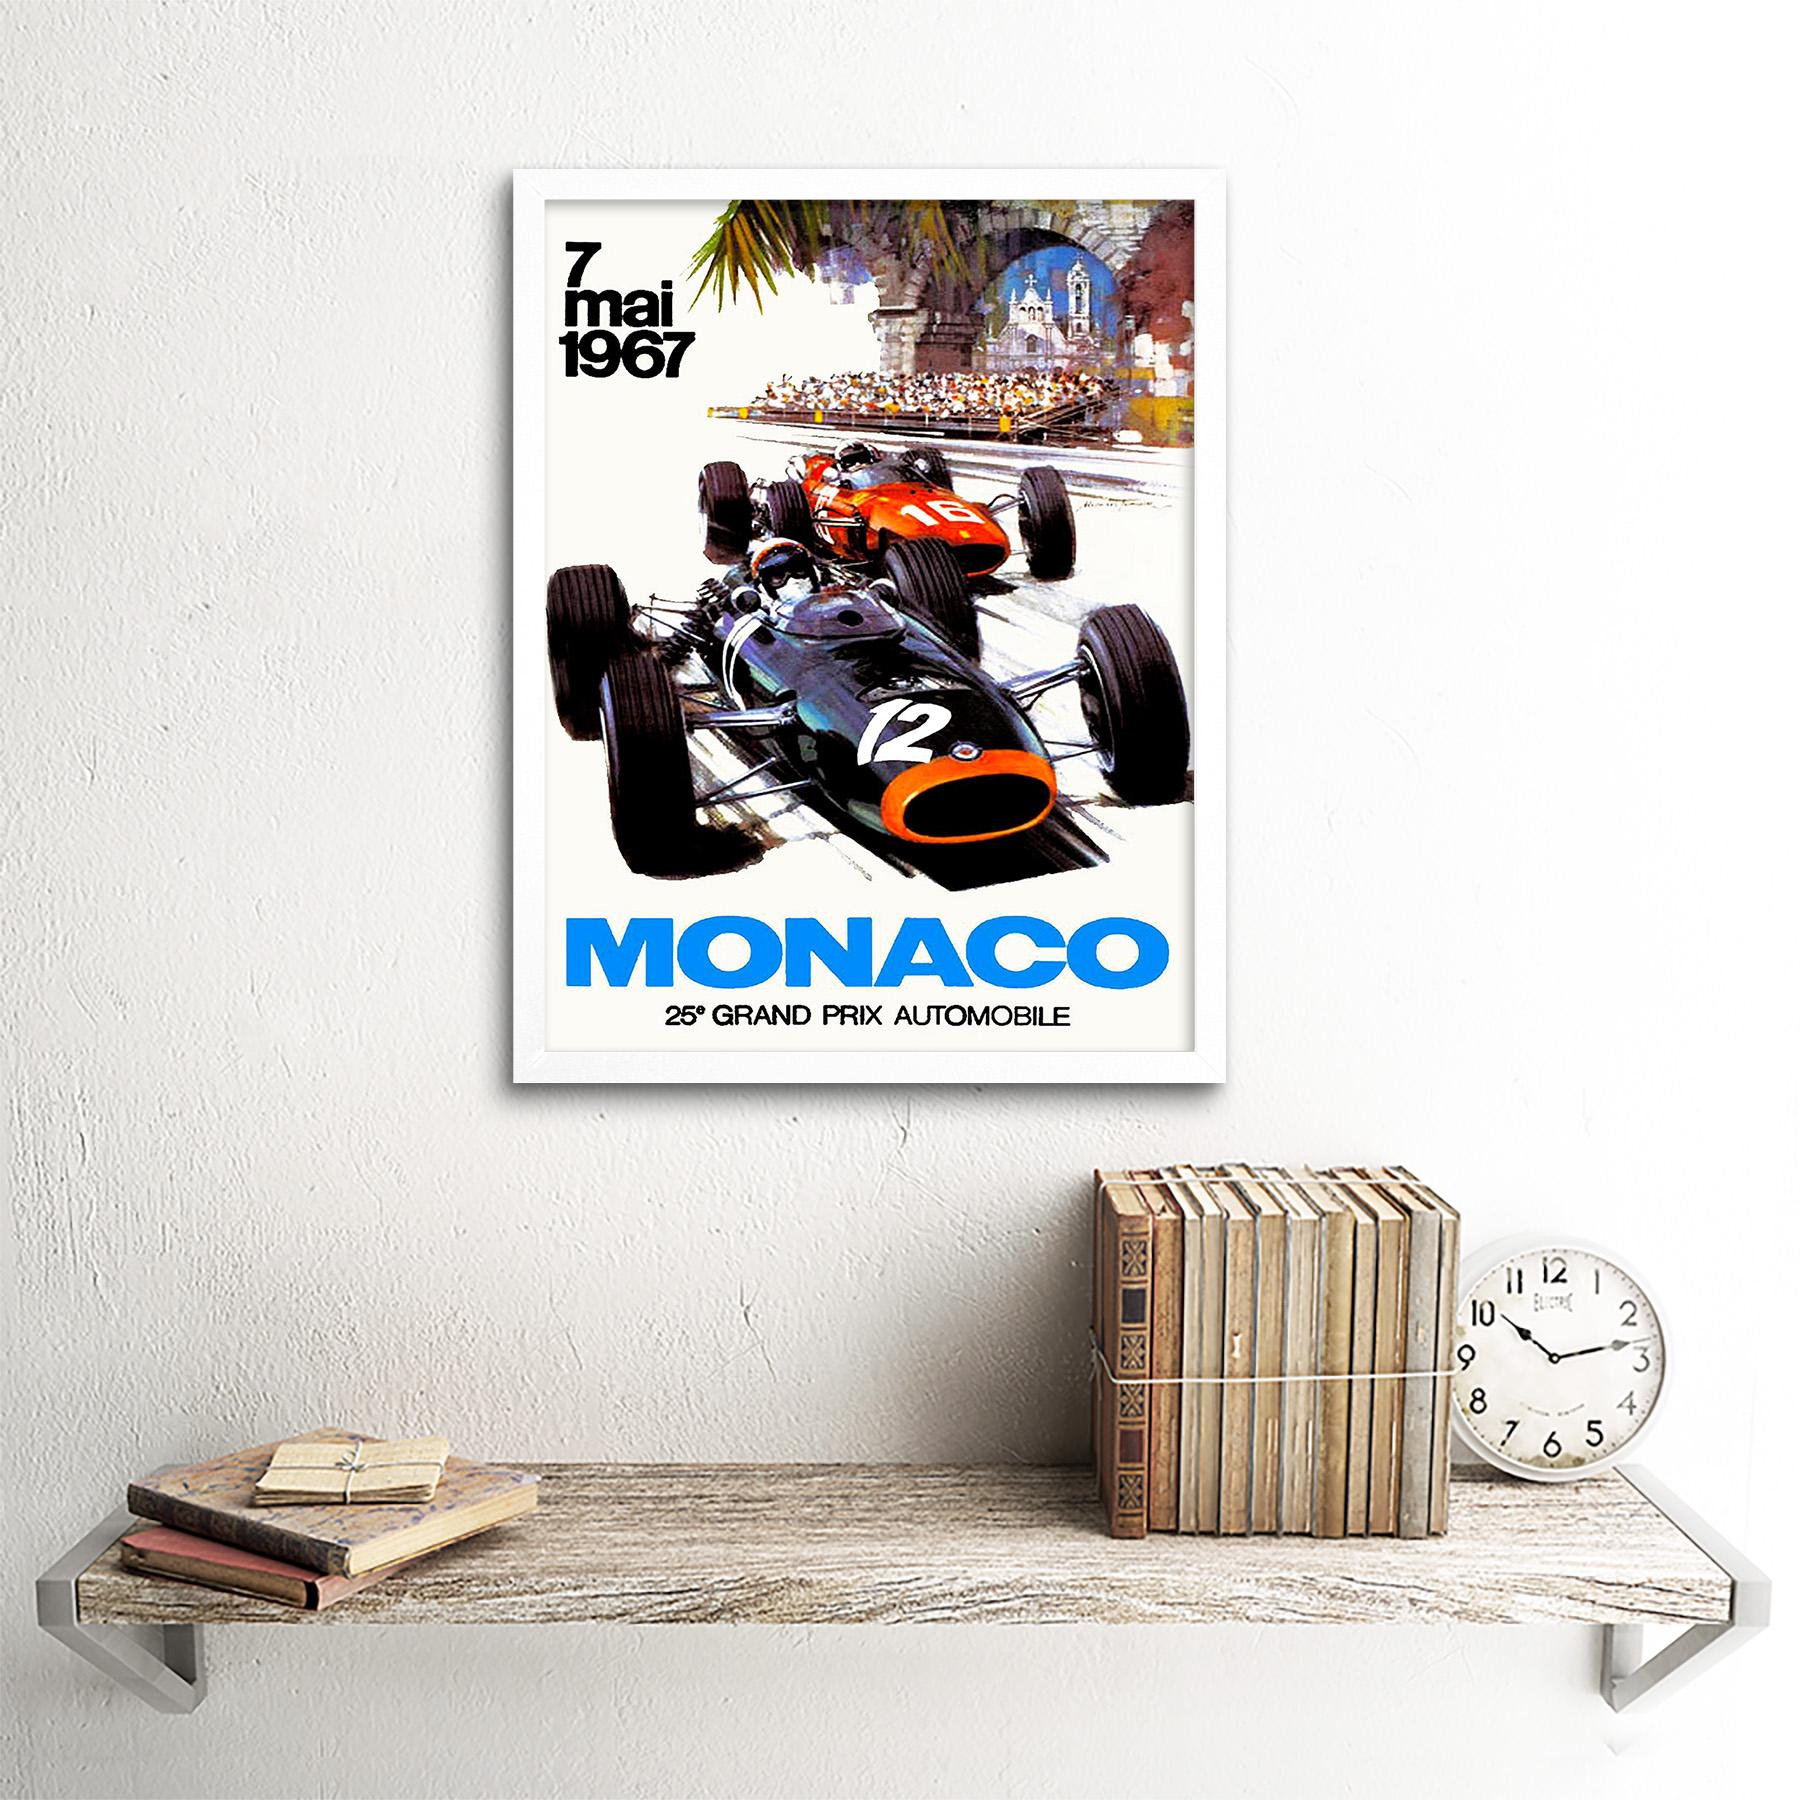 Vintage-Transport-Monaco-25-Grand-Prix-Automobile-1967-Race-12X16-Framed-Print thumbnail 18